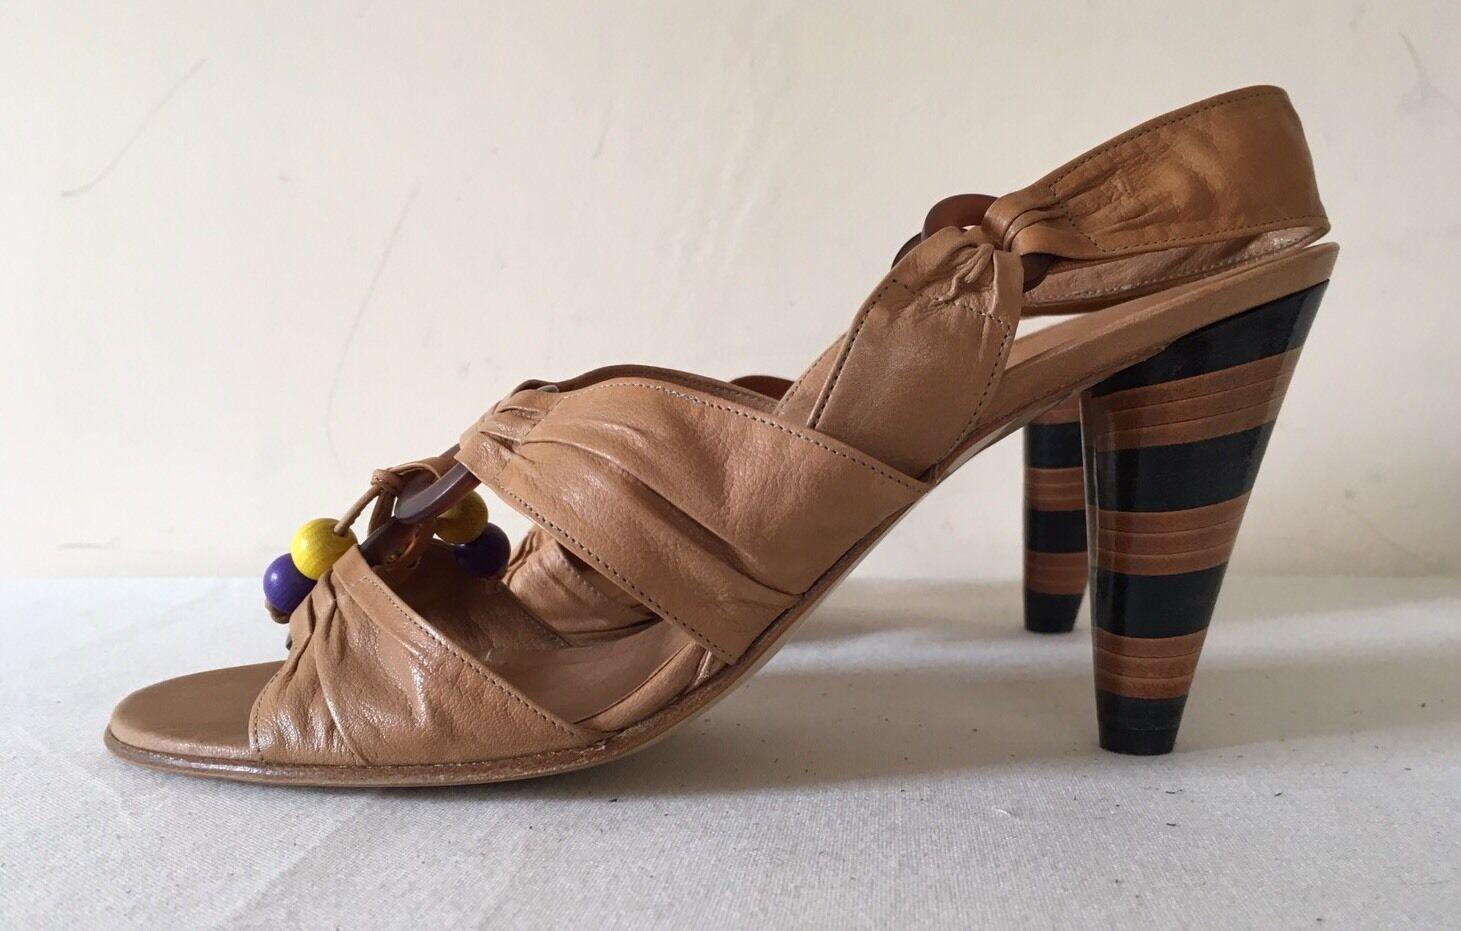 Summer Heels - Georgina Goodman Topaz - BNIB - EU 38.5 - MUST GO